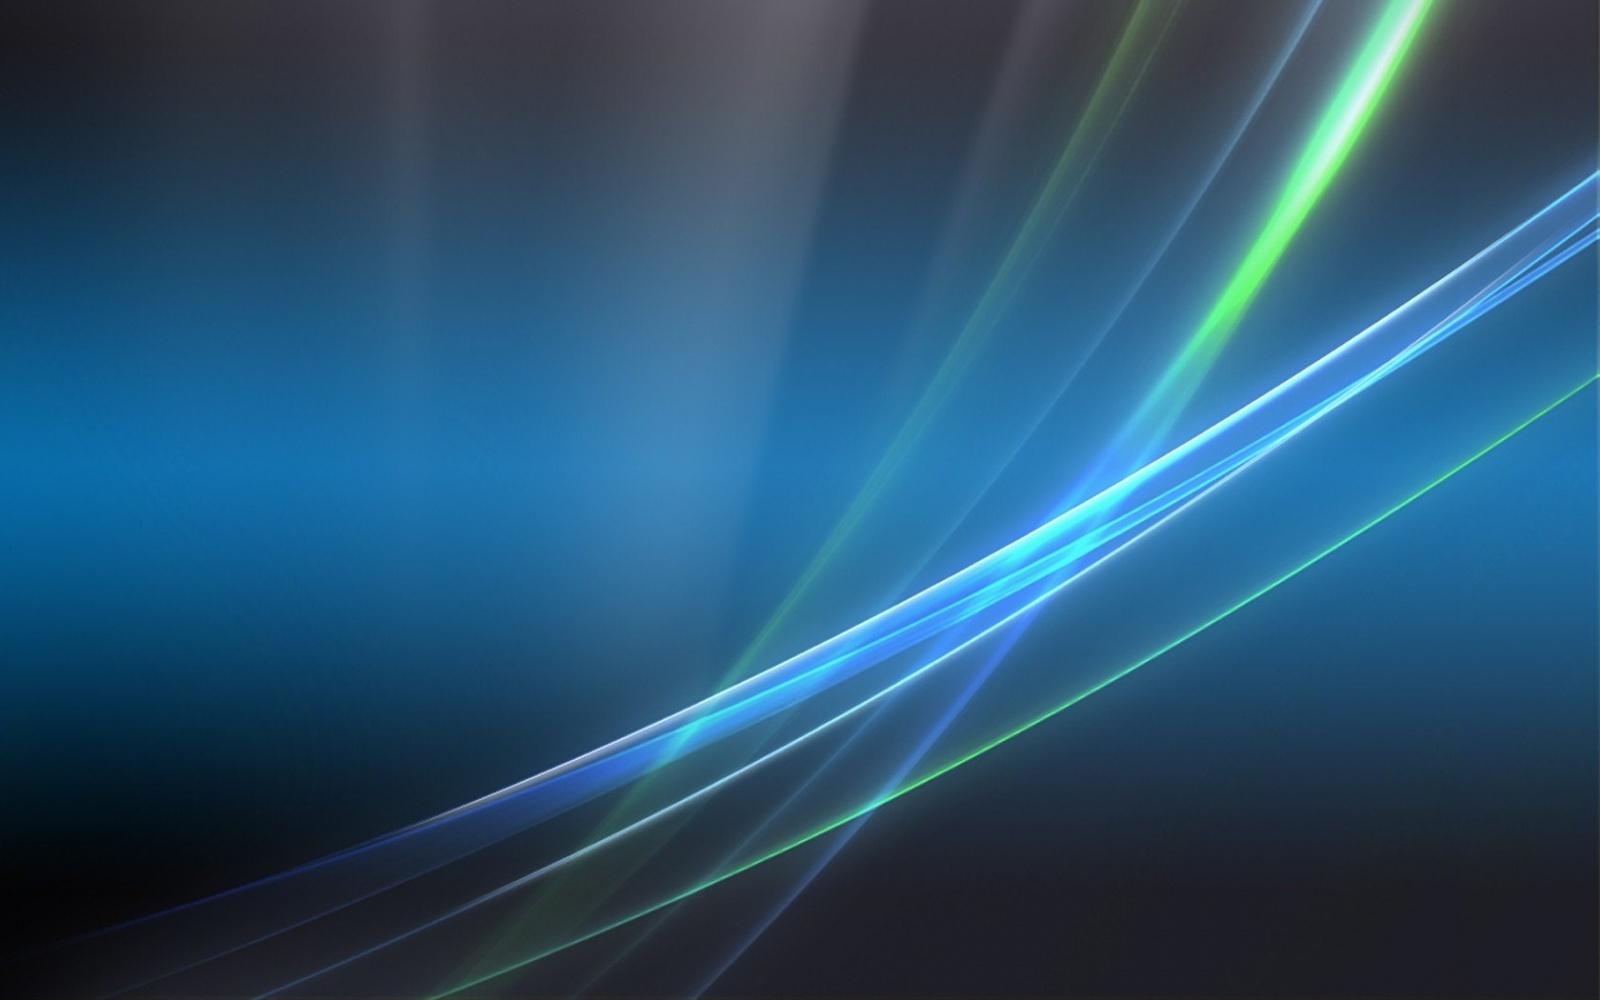 http://3.bp.blogspot.com/-rhrylWQt46E/UJPIHoIob2I/AAAAAAAABJk/_Wzrc-VoglE/s1600/backgrounds-for-windows-1.jpg